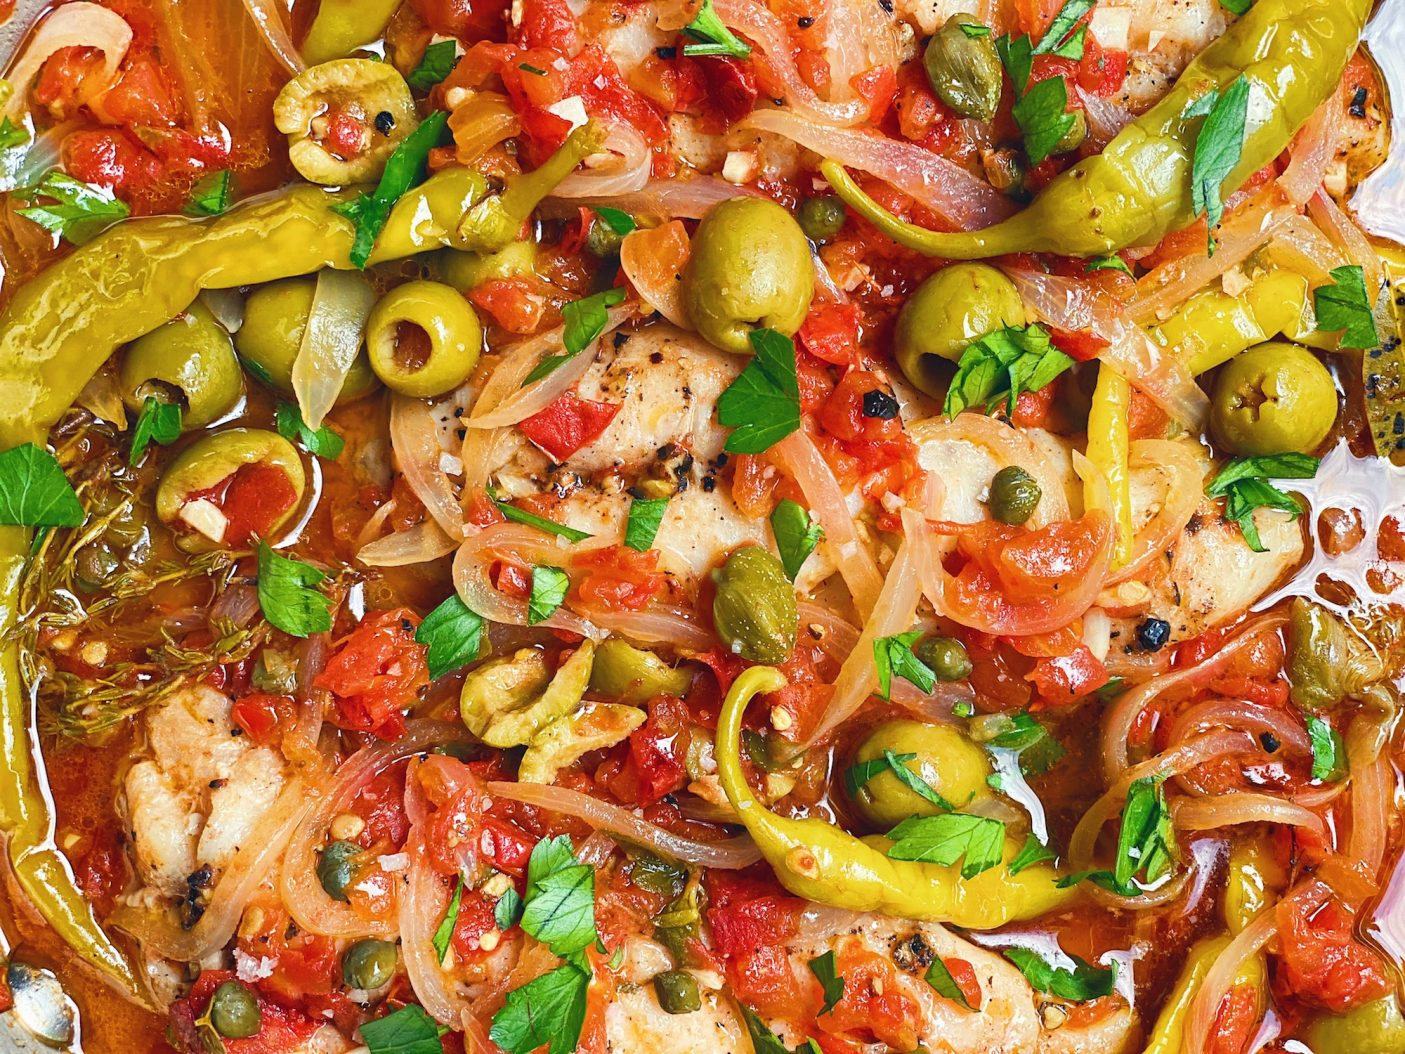 wu-haus-pescado-veracruz-mexico-red-snapper-veracruz-recipe-mexico-fish